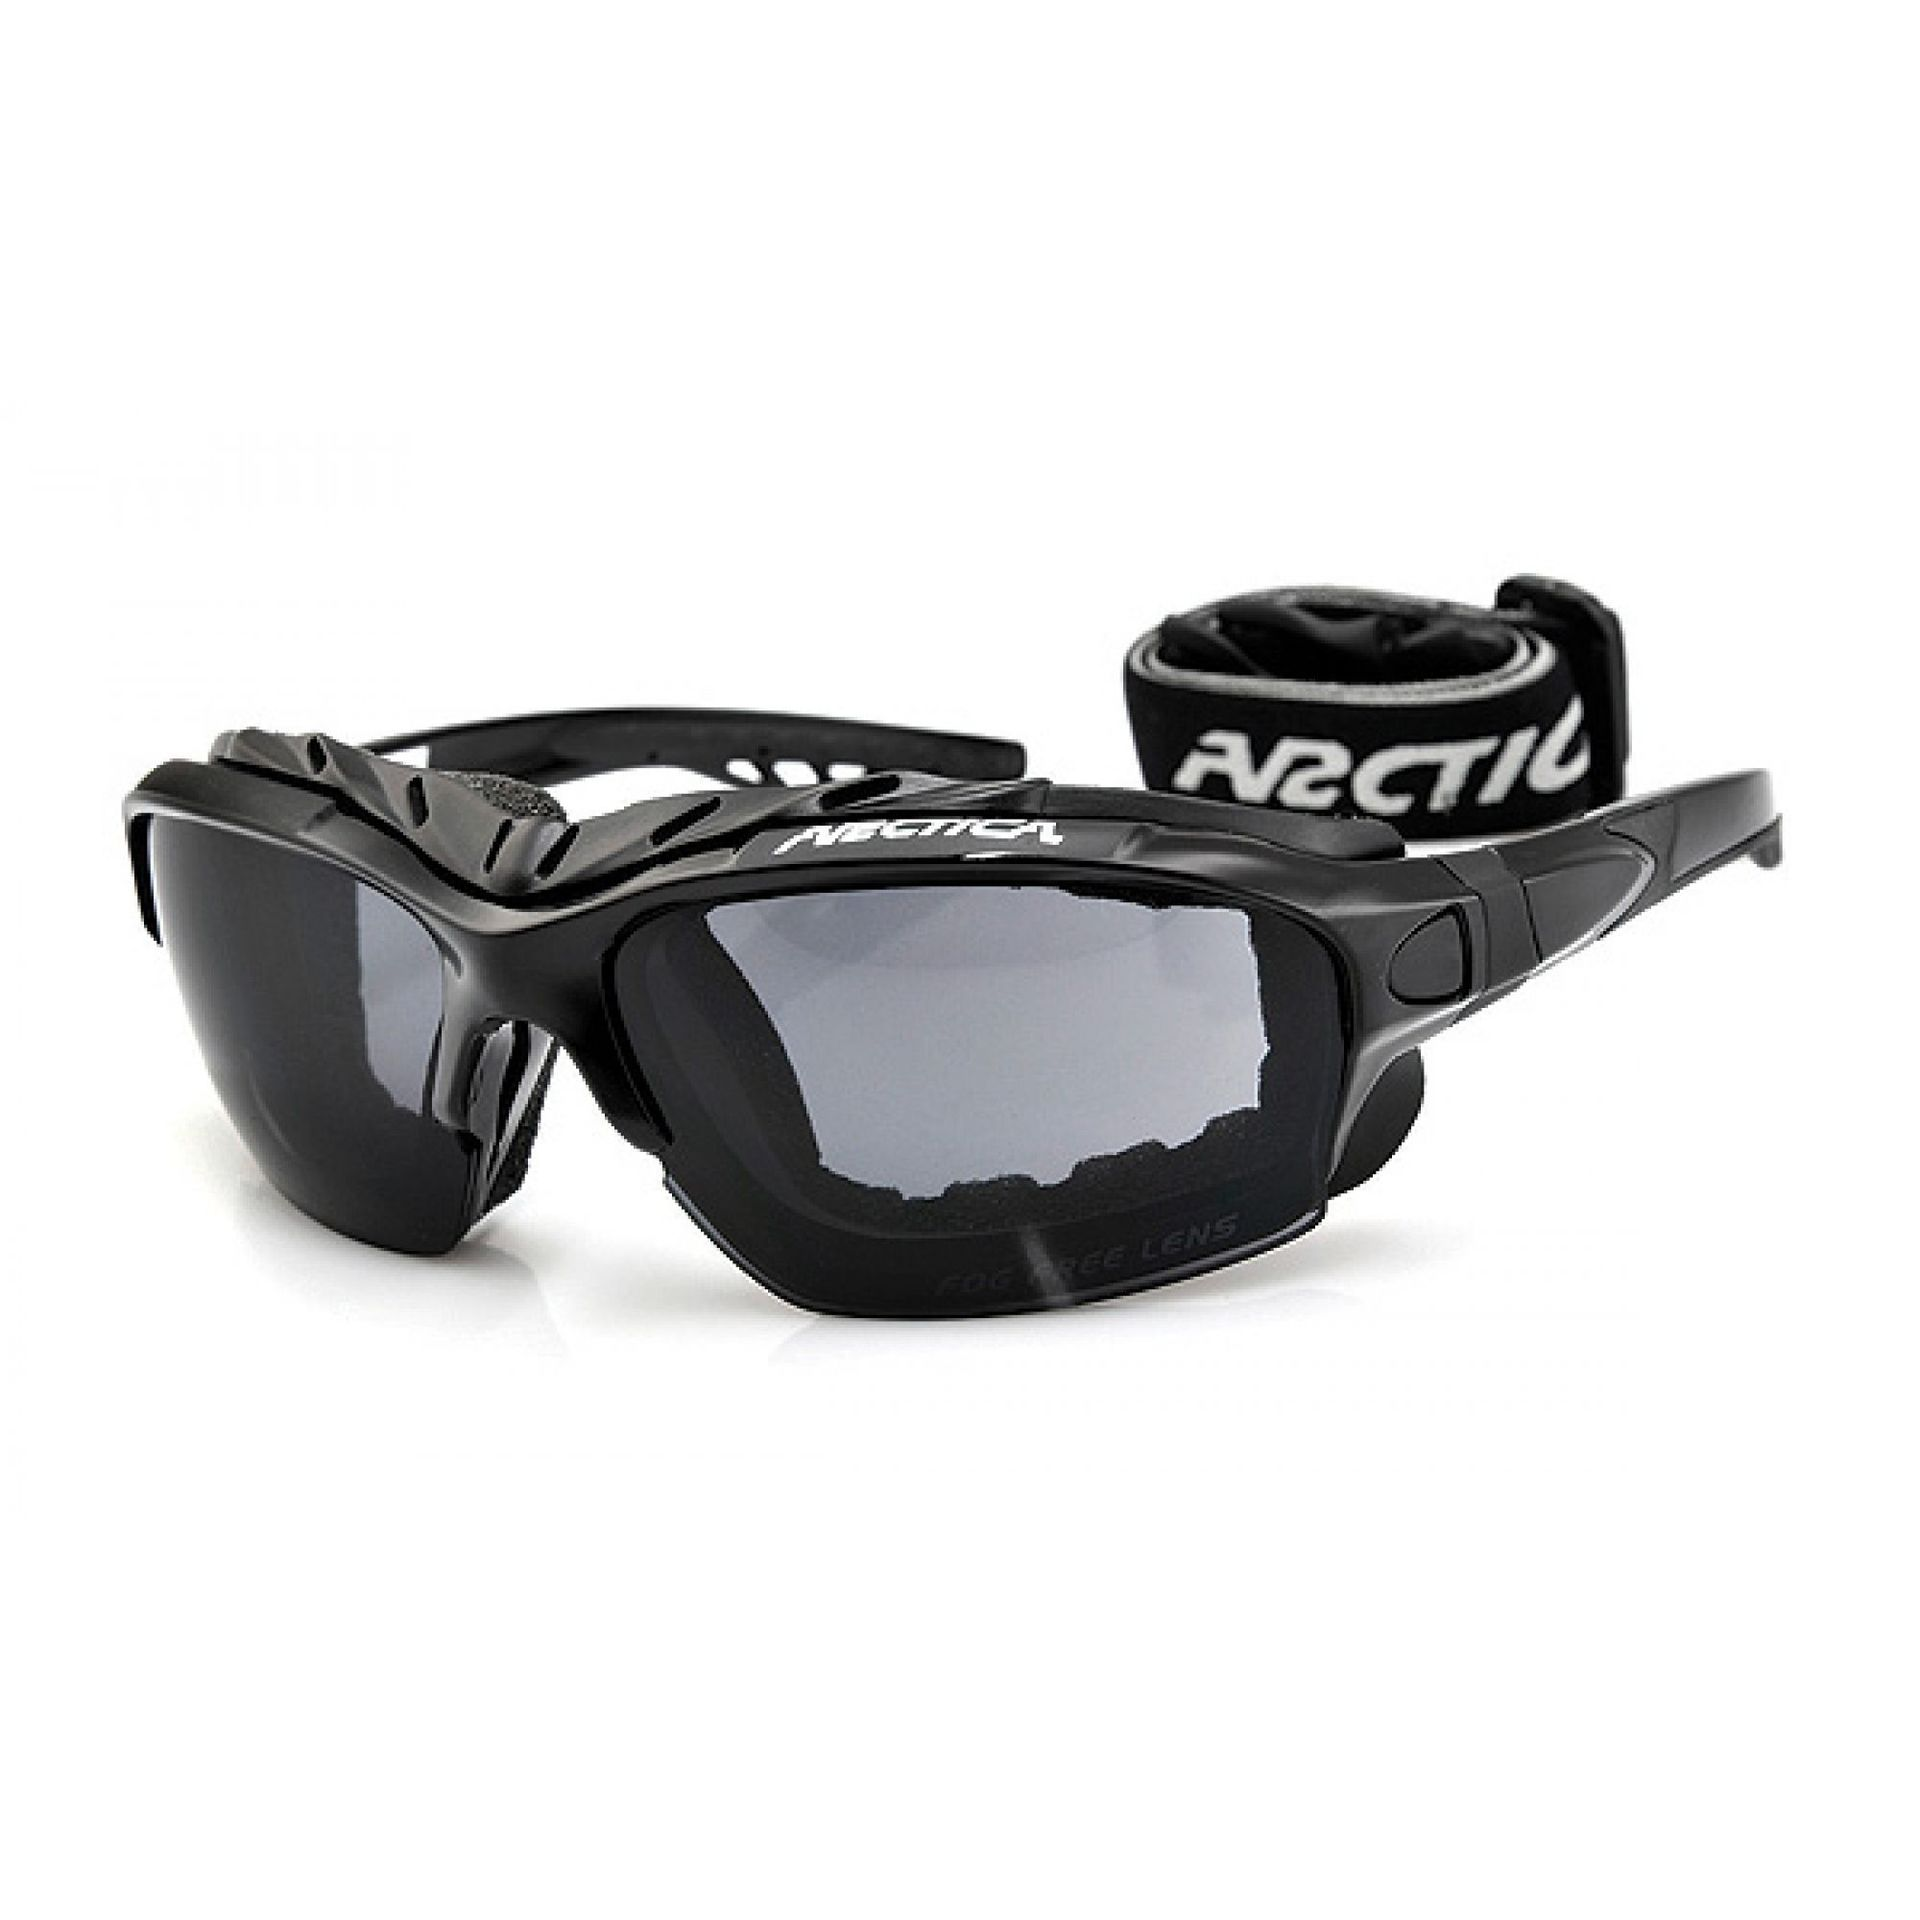 Okulary Arctica S-163 czarno szare